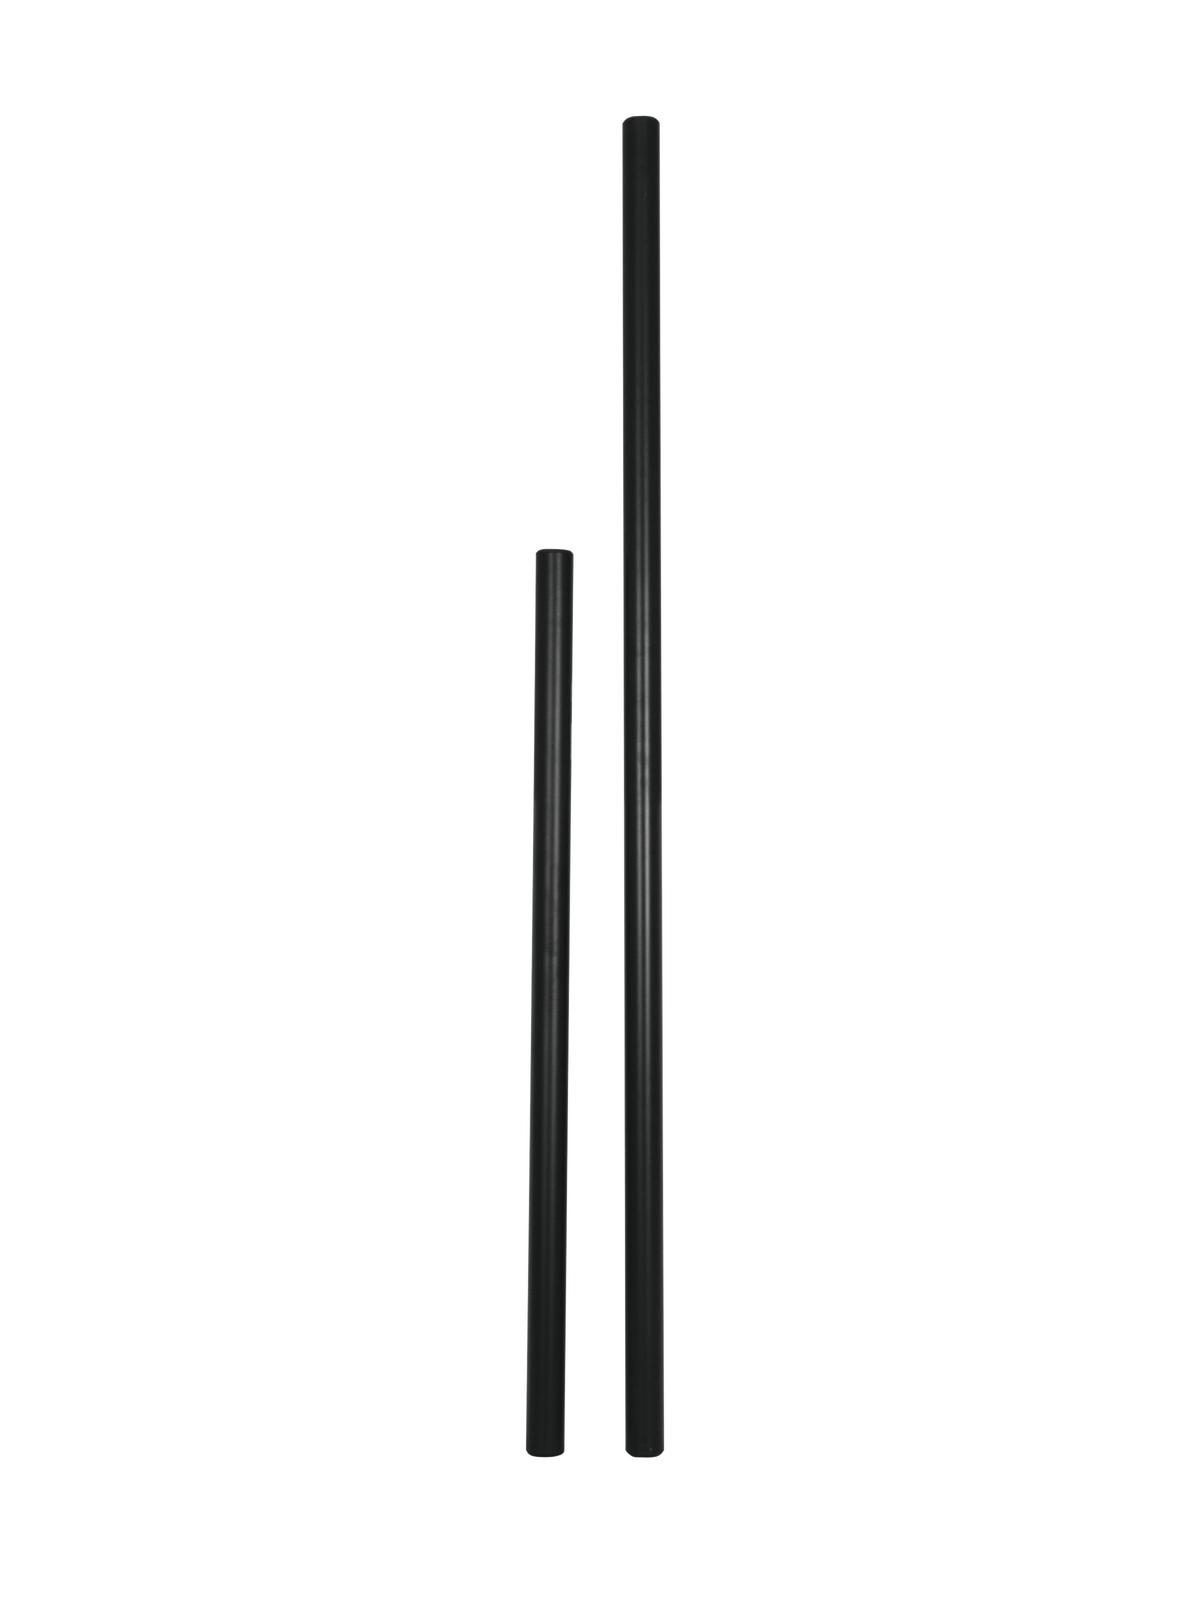 OMNITRONIC Distanzstange Bassbox/Hochtonbox 120cm